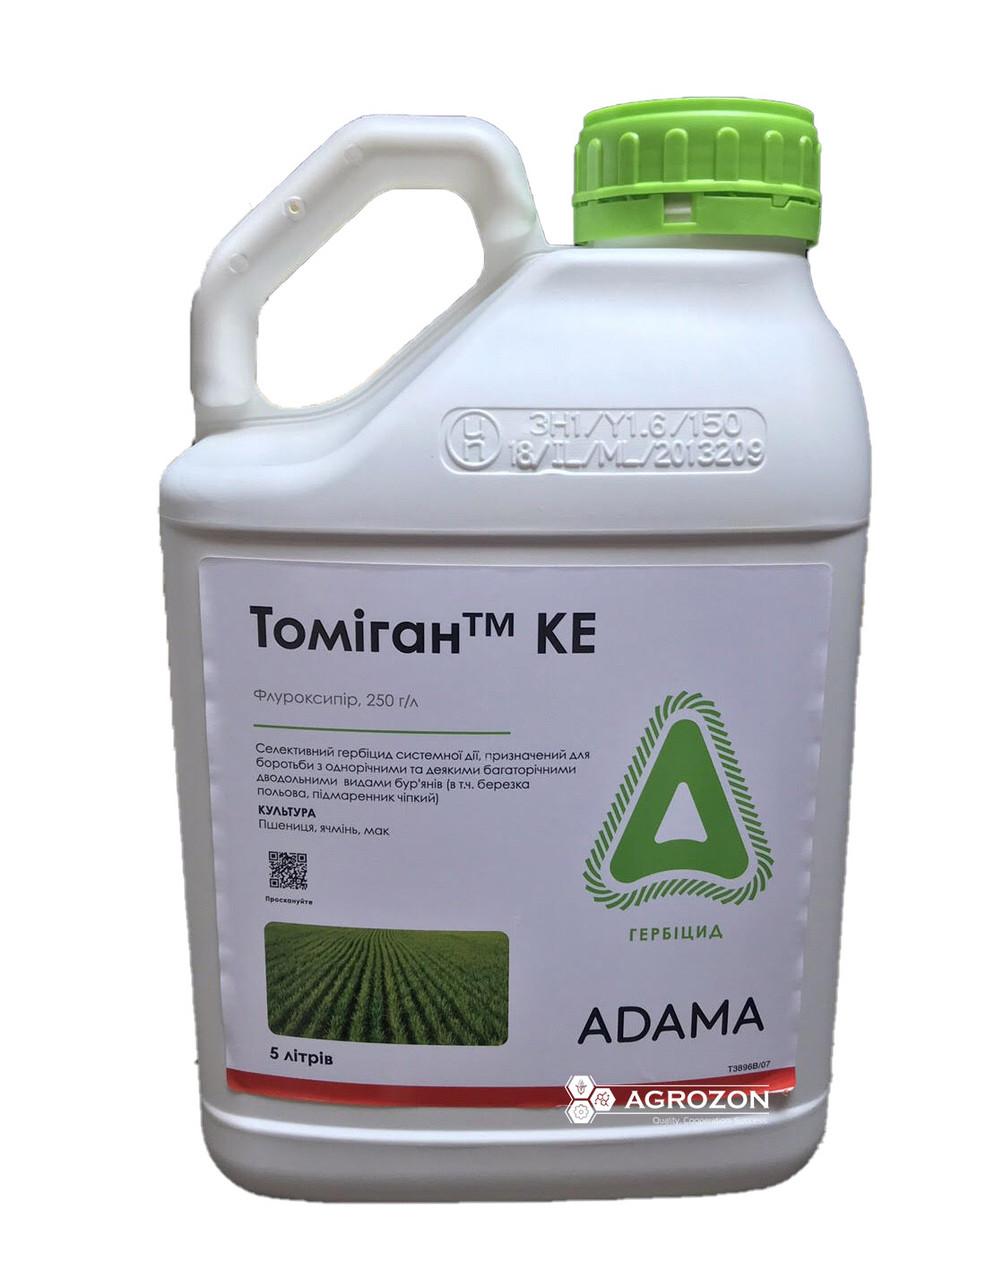 Гербицид Томиган, ADAMA - 5 л